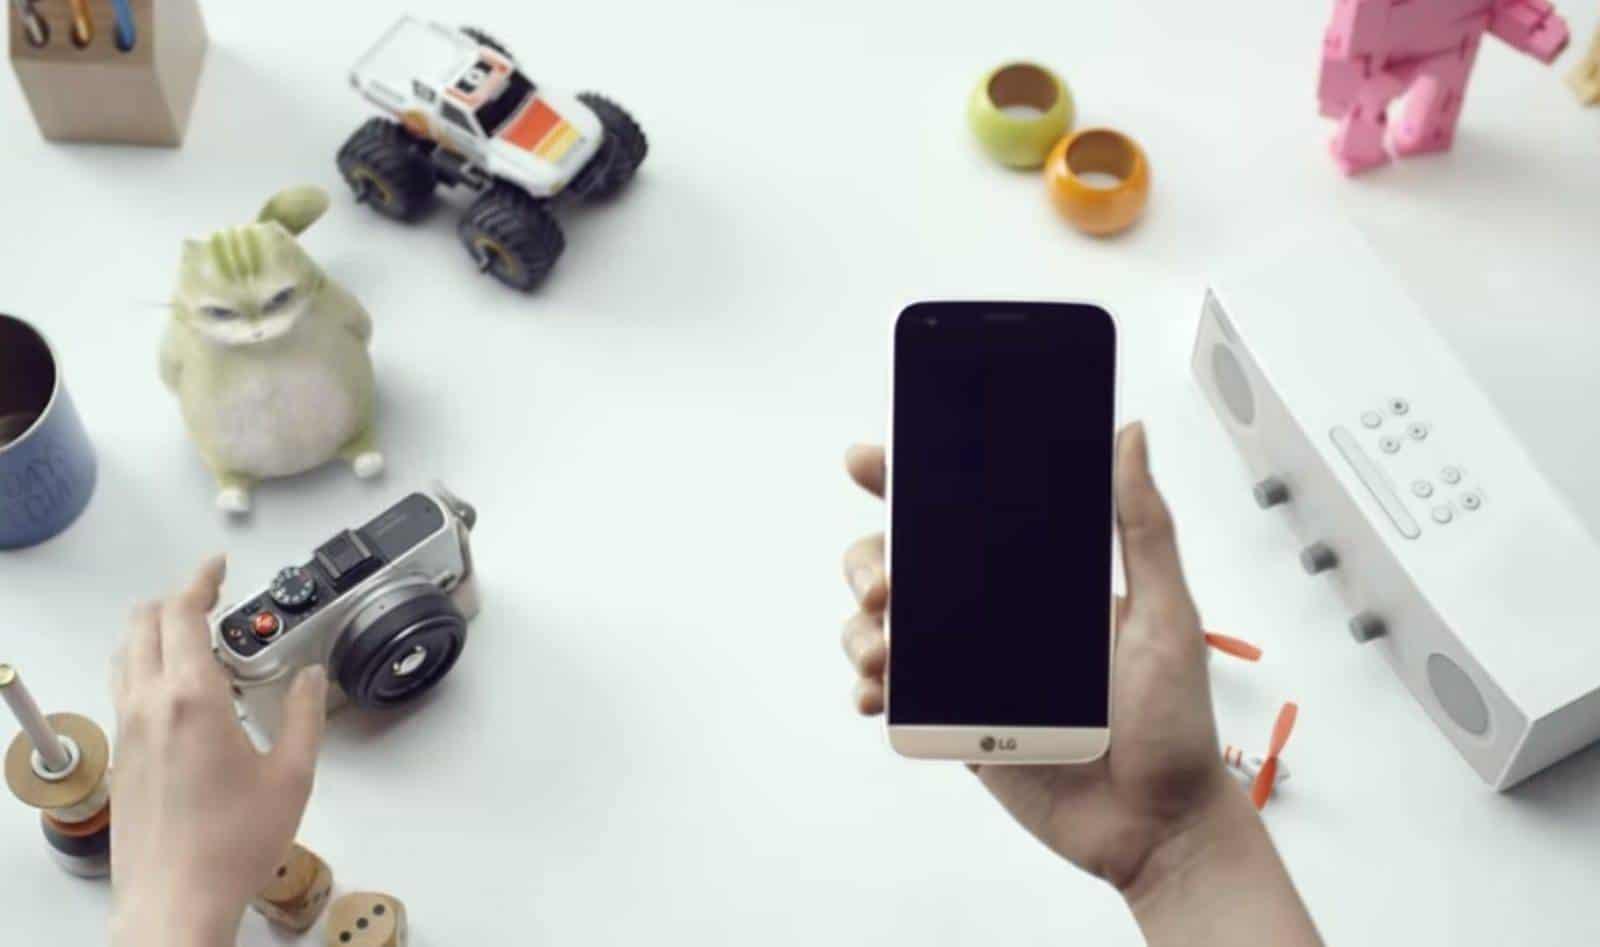 LG G5 Gold promo video